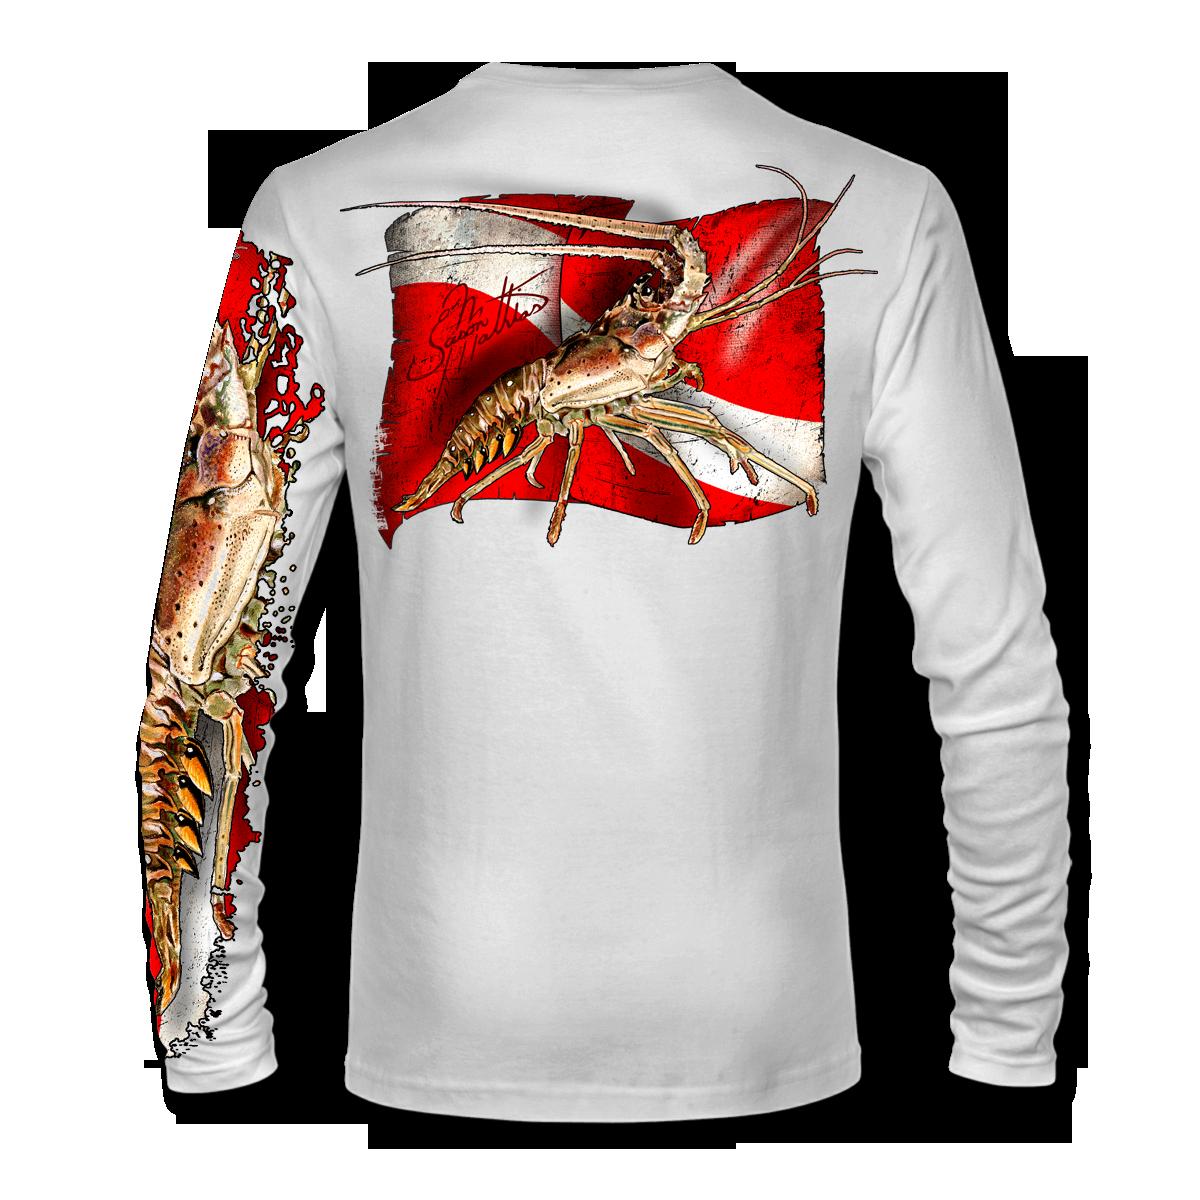 jason-mathias-shirt-line-back-white-lobster-shirt.png